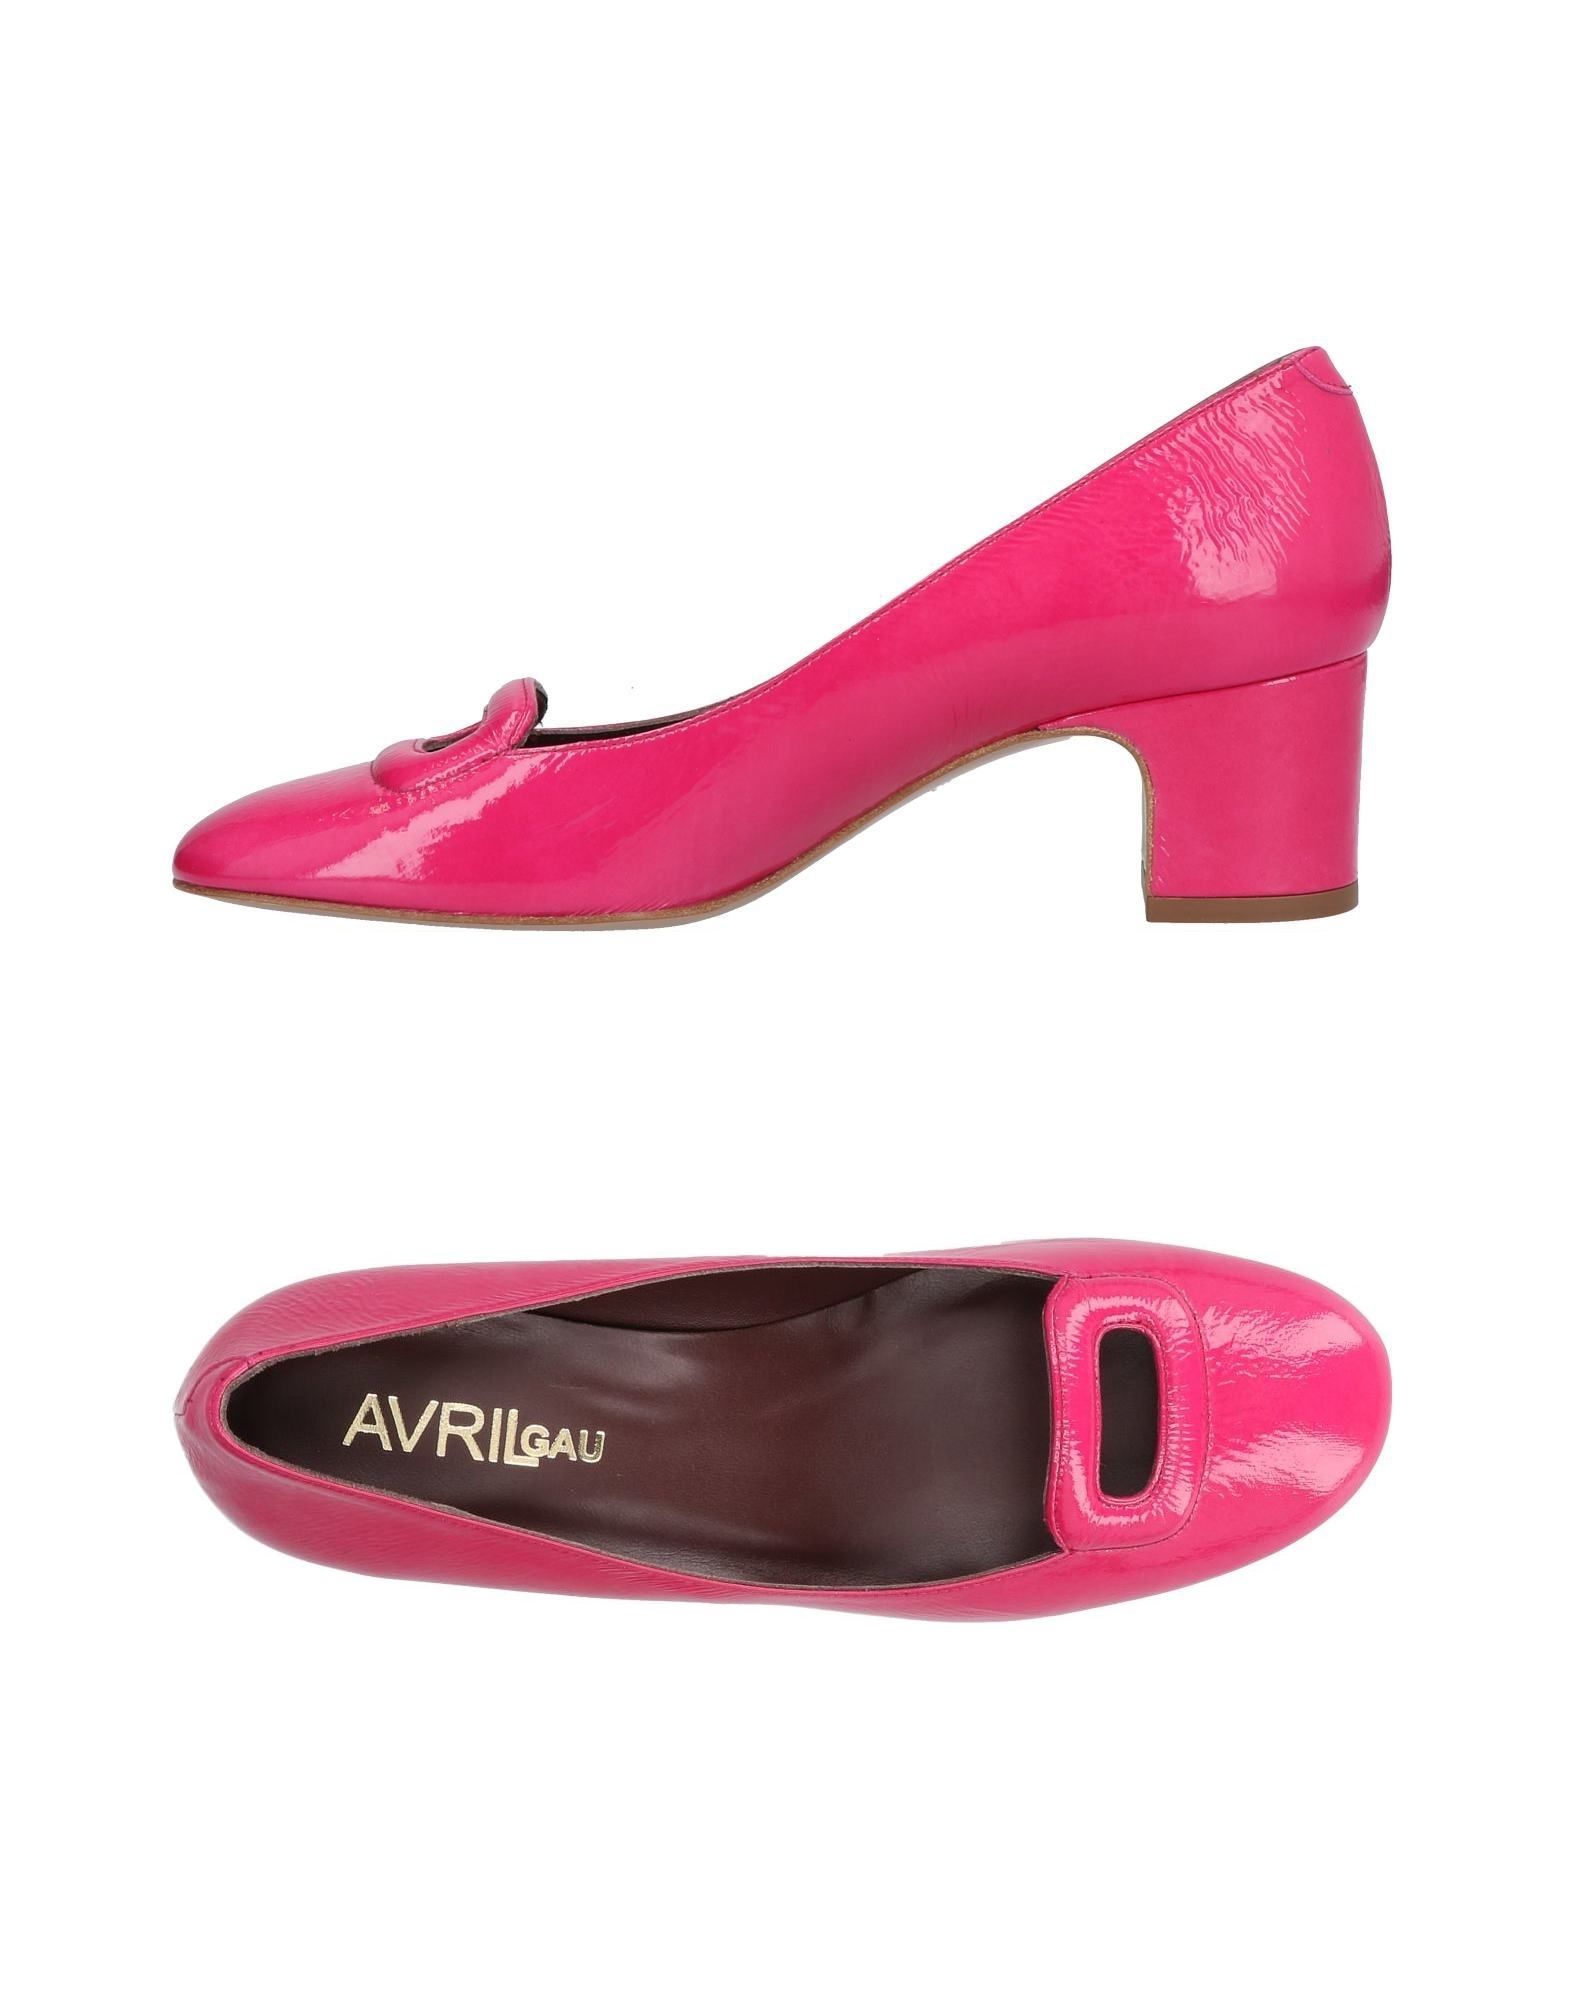 Escarpins Avril Gau Femme - Escarpins Avril Gau sur